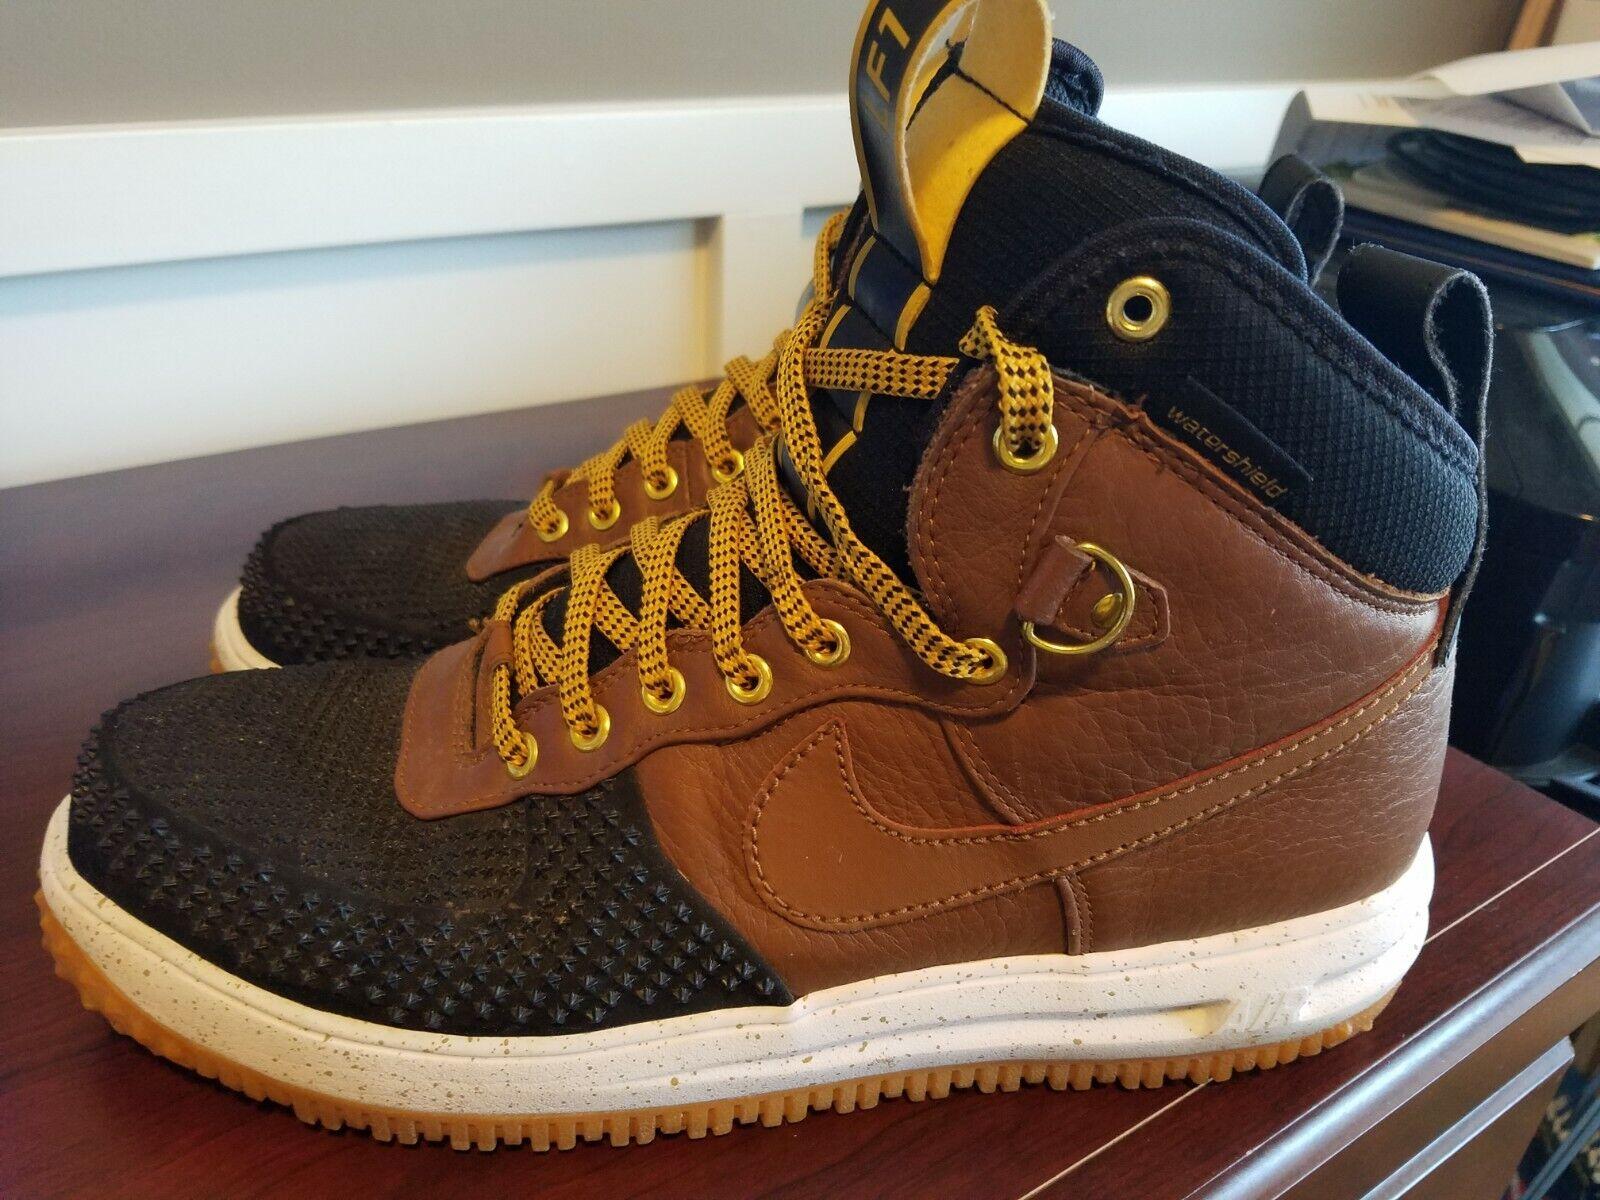 Nike Lunar Air Force One 1 Duckboot Tan Black 805899 004 Men's Size 13